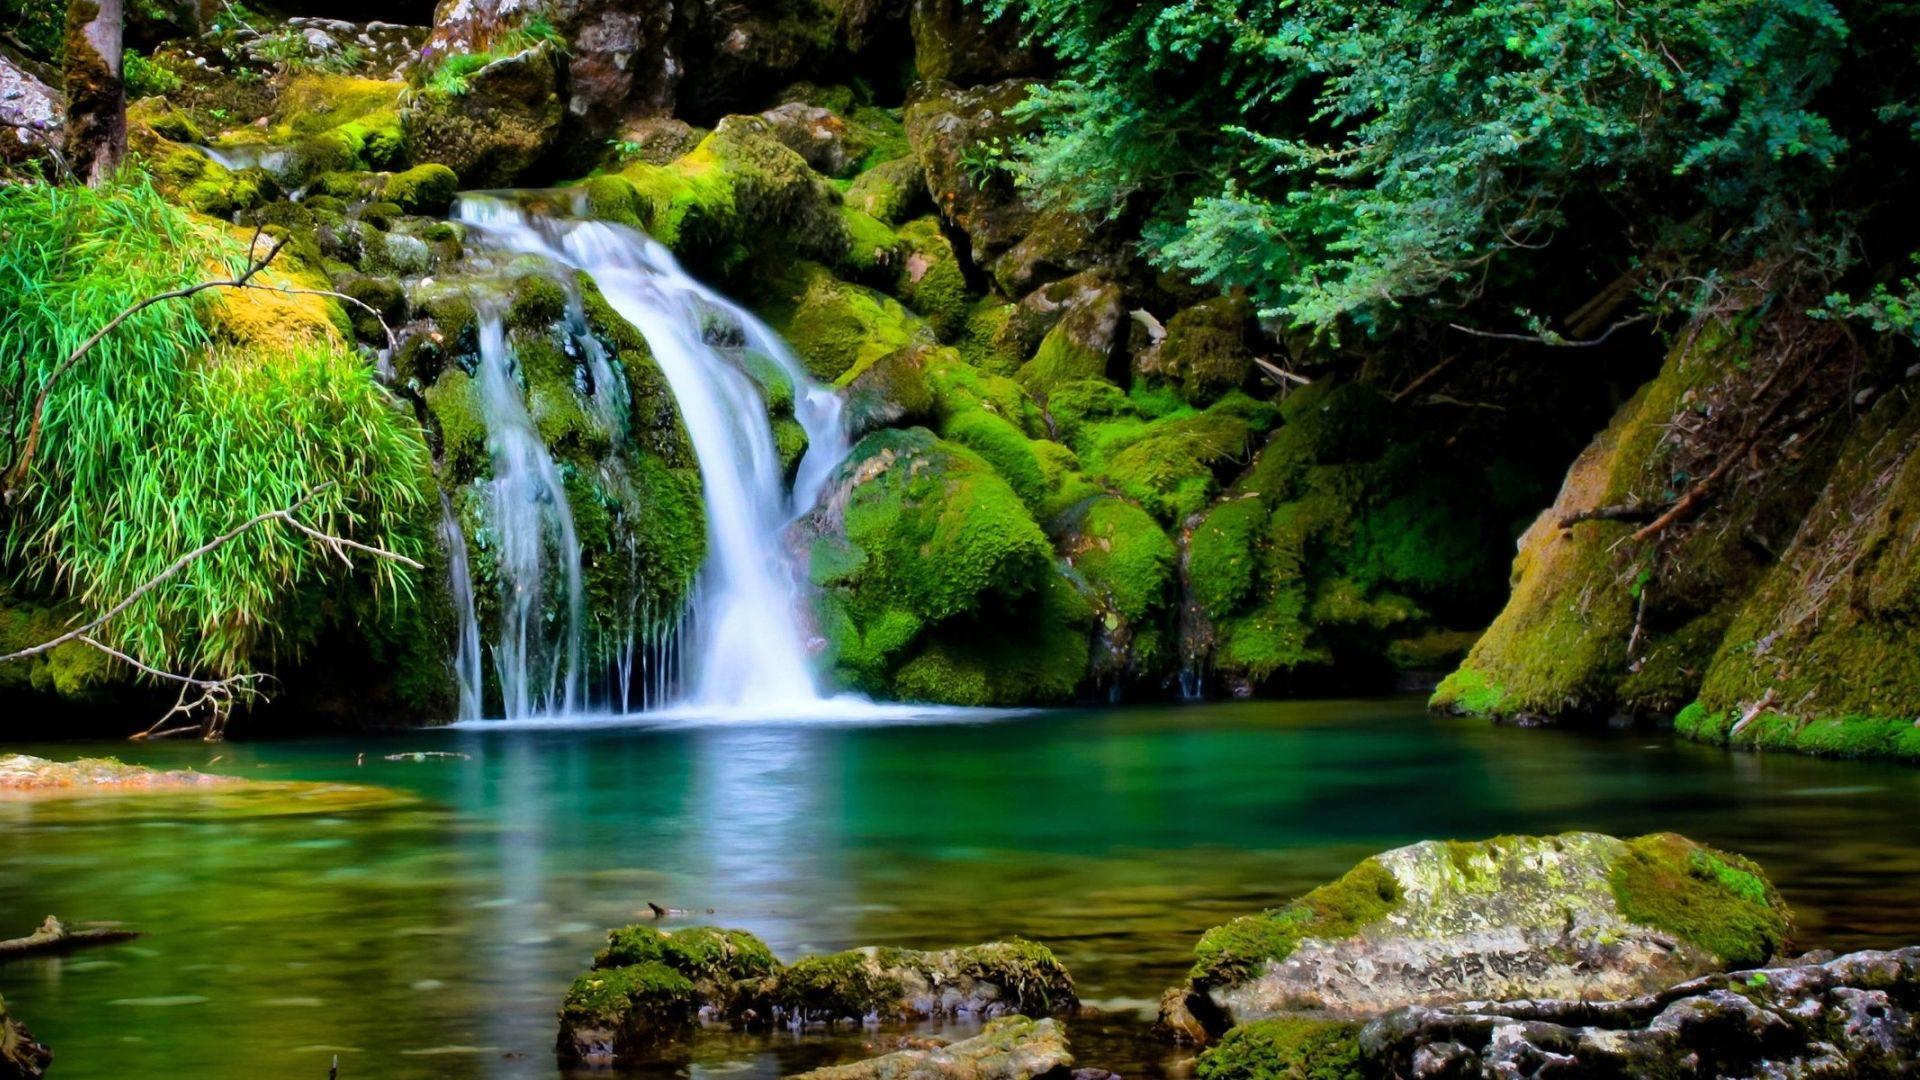 Nature Backgrounds Waterfall Scenery Beautiful Nature Wallpaper Waterfall Wallpaper